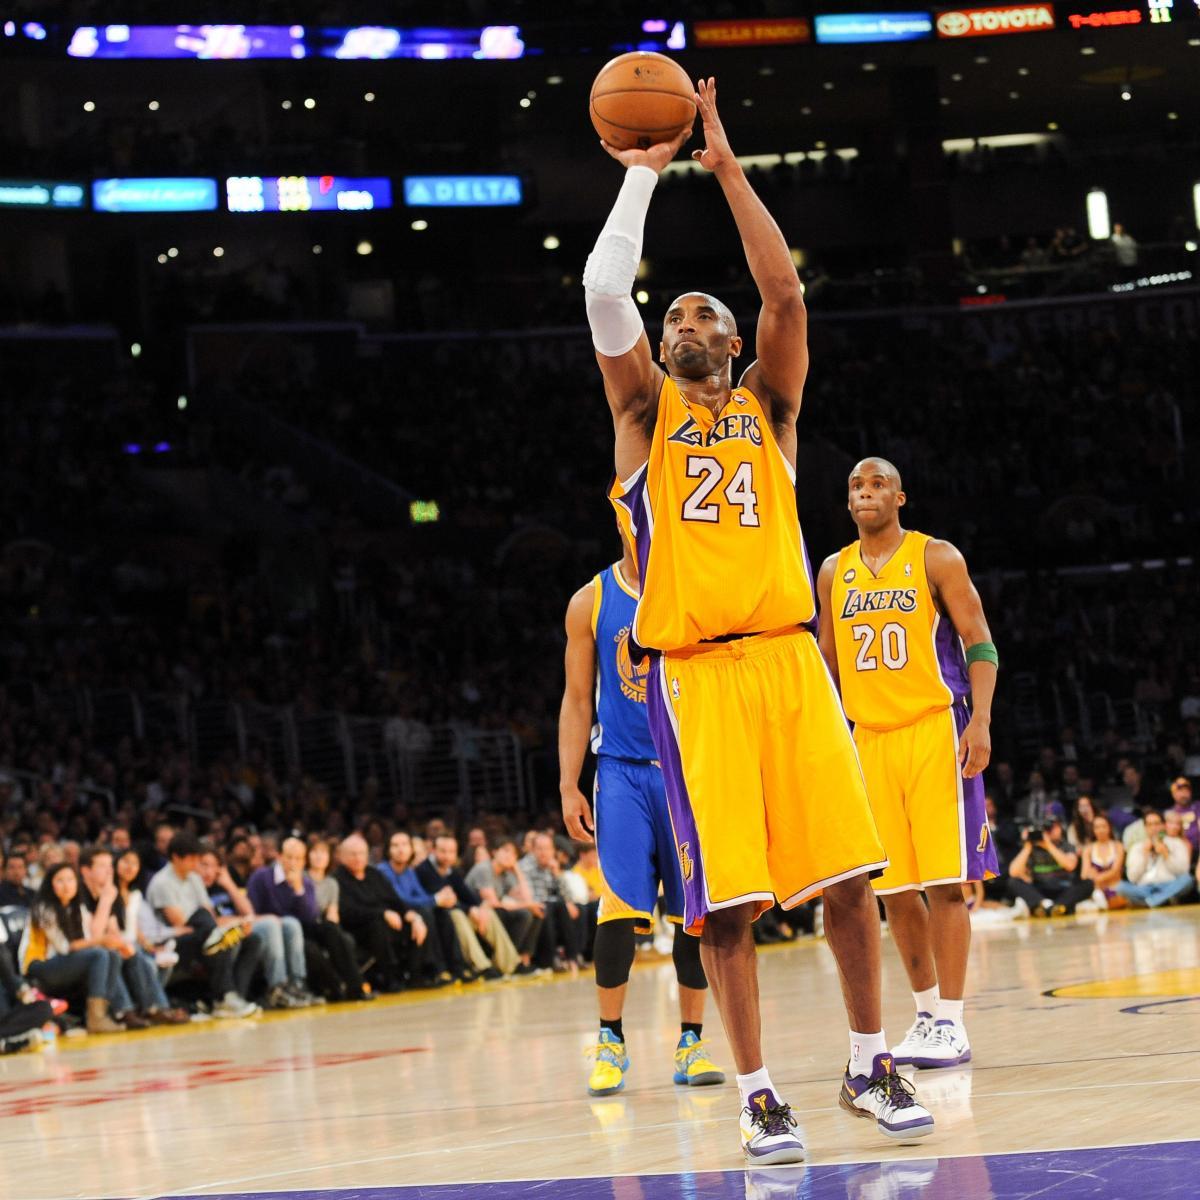 Why Kobe Bryant Is Poised To Be A Dominant NBA Star Again